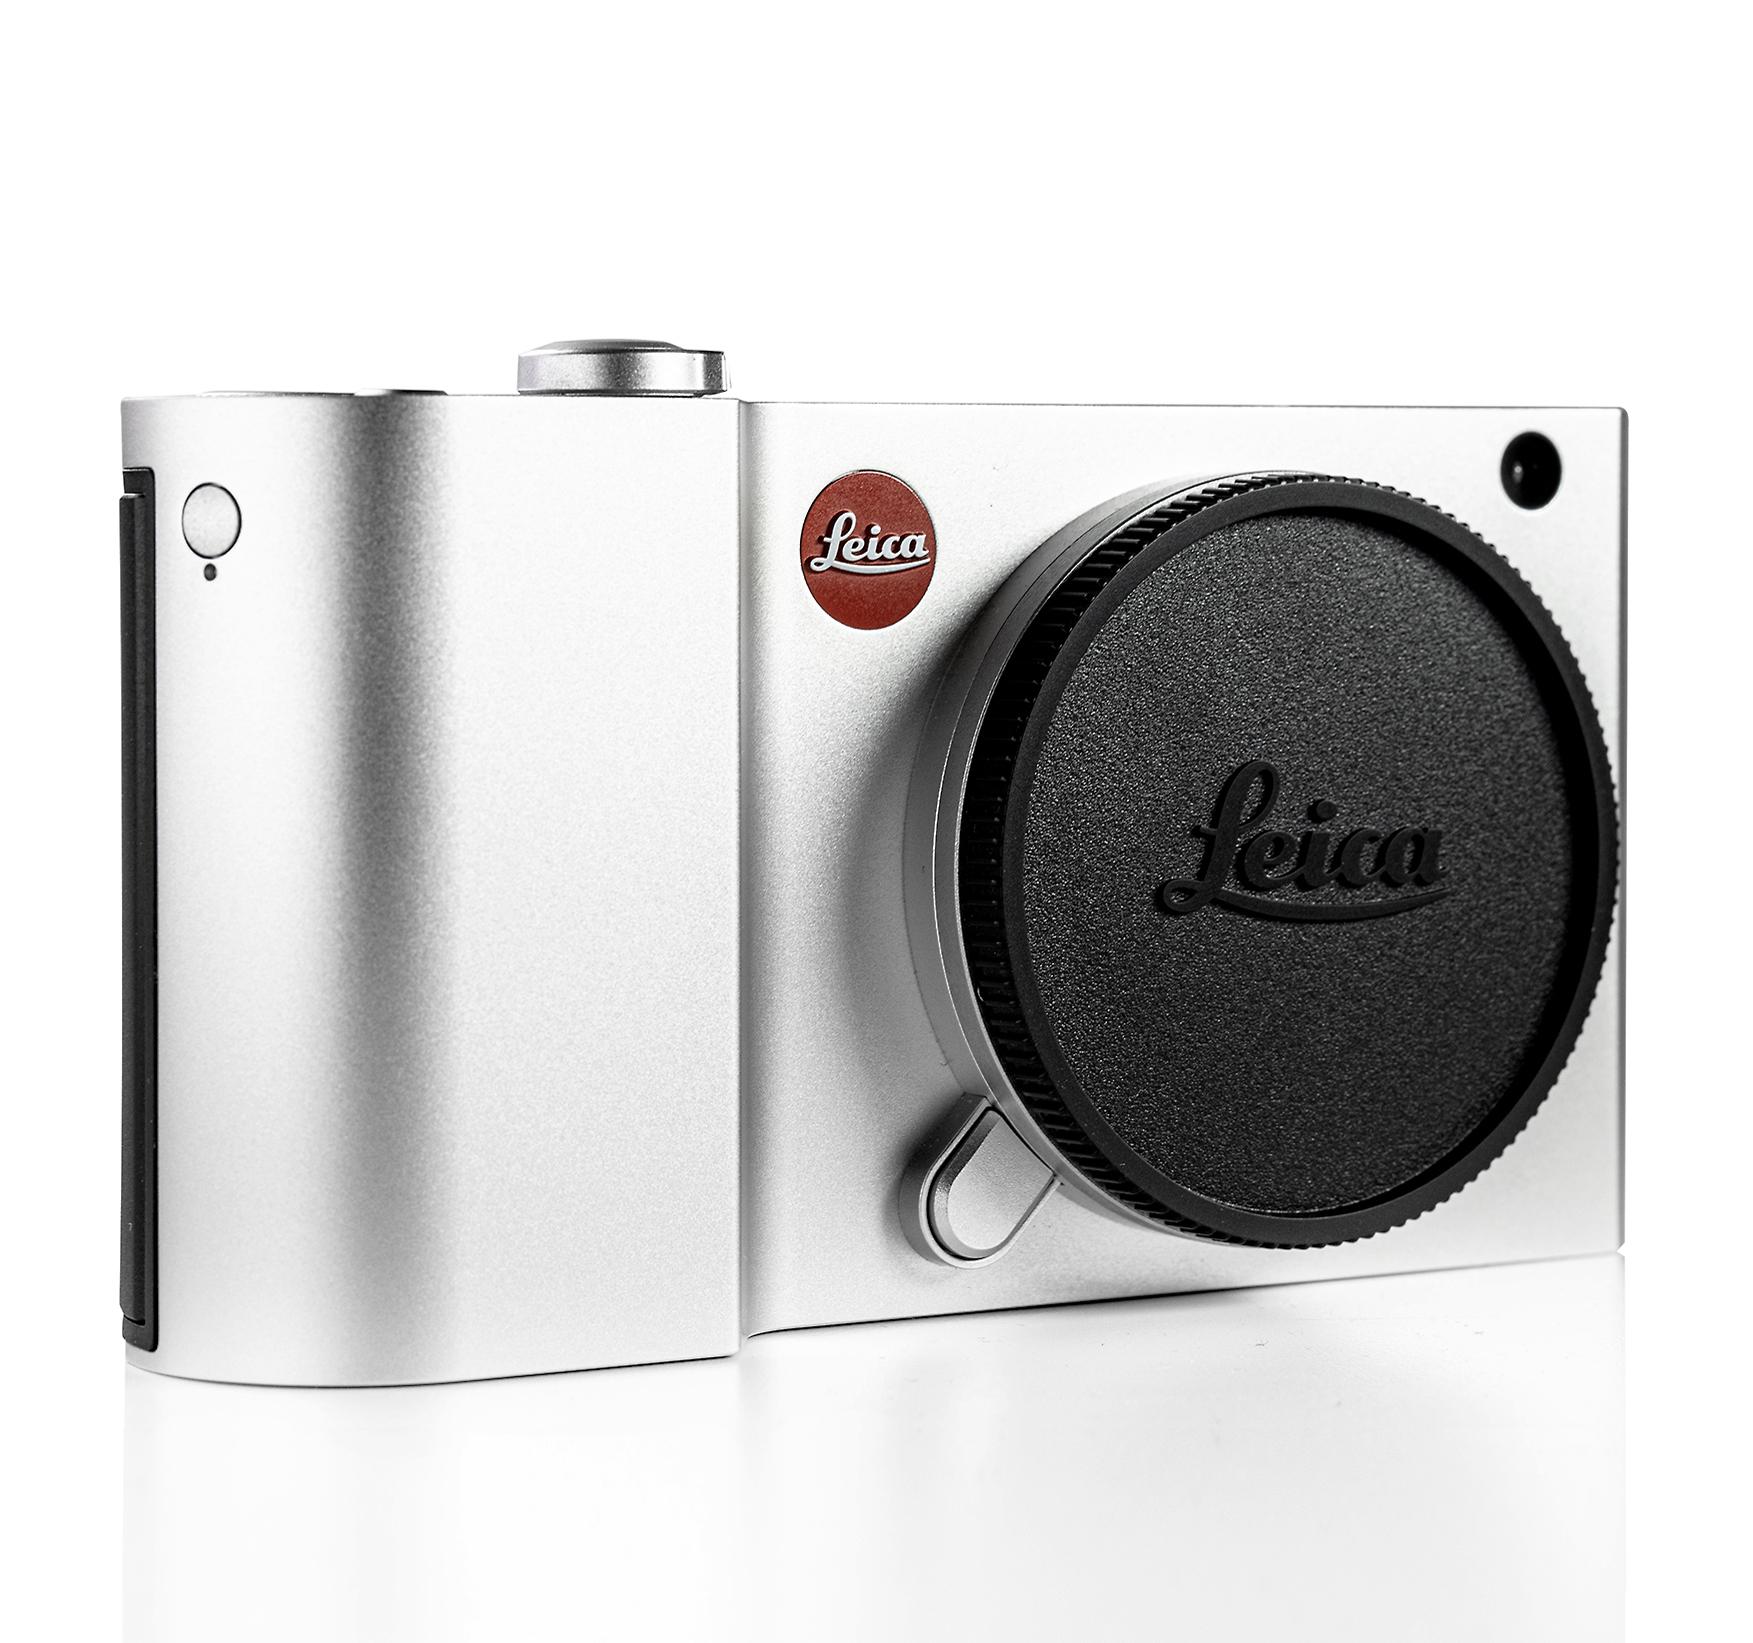 Gelegenheiten Leica T silber